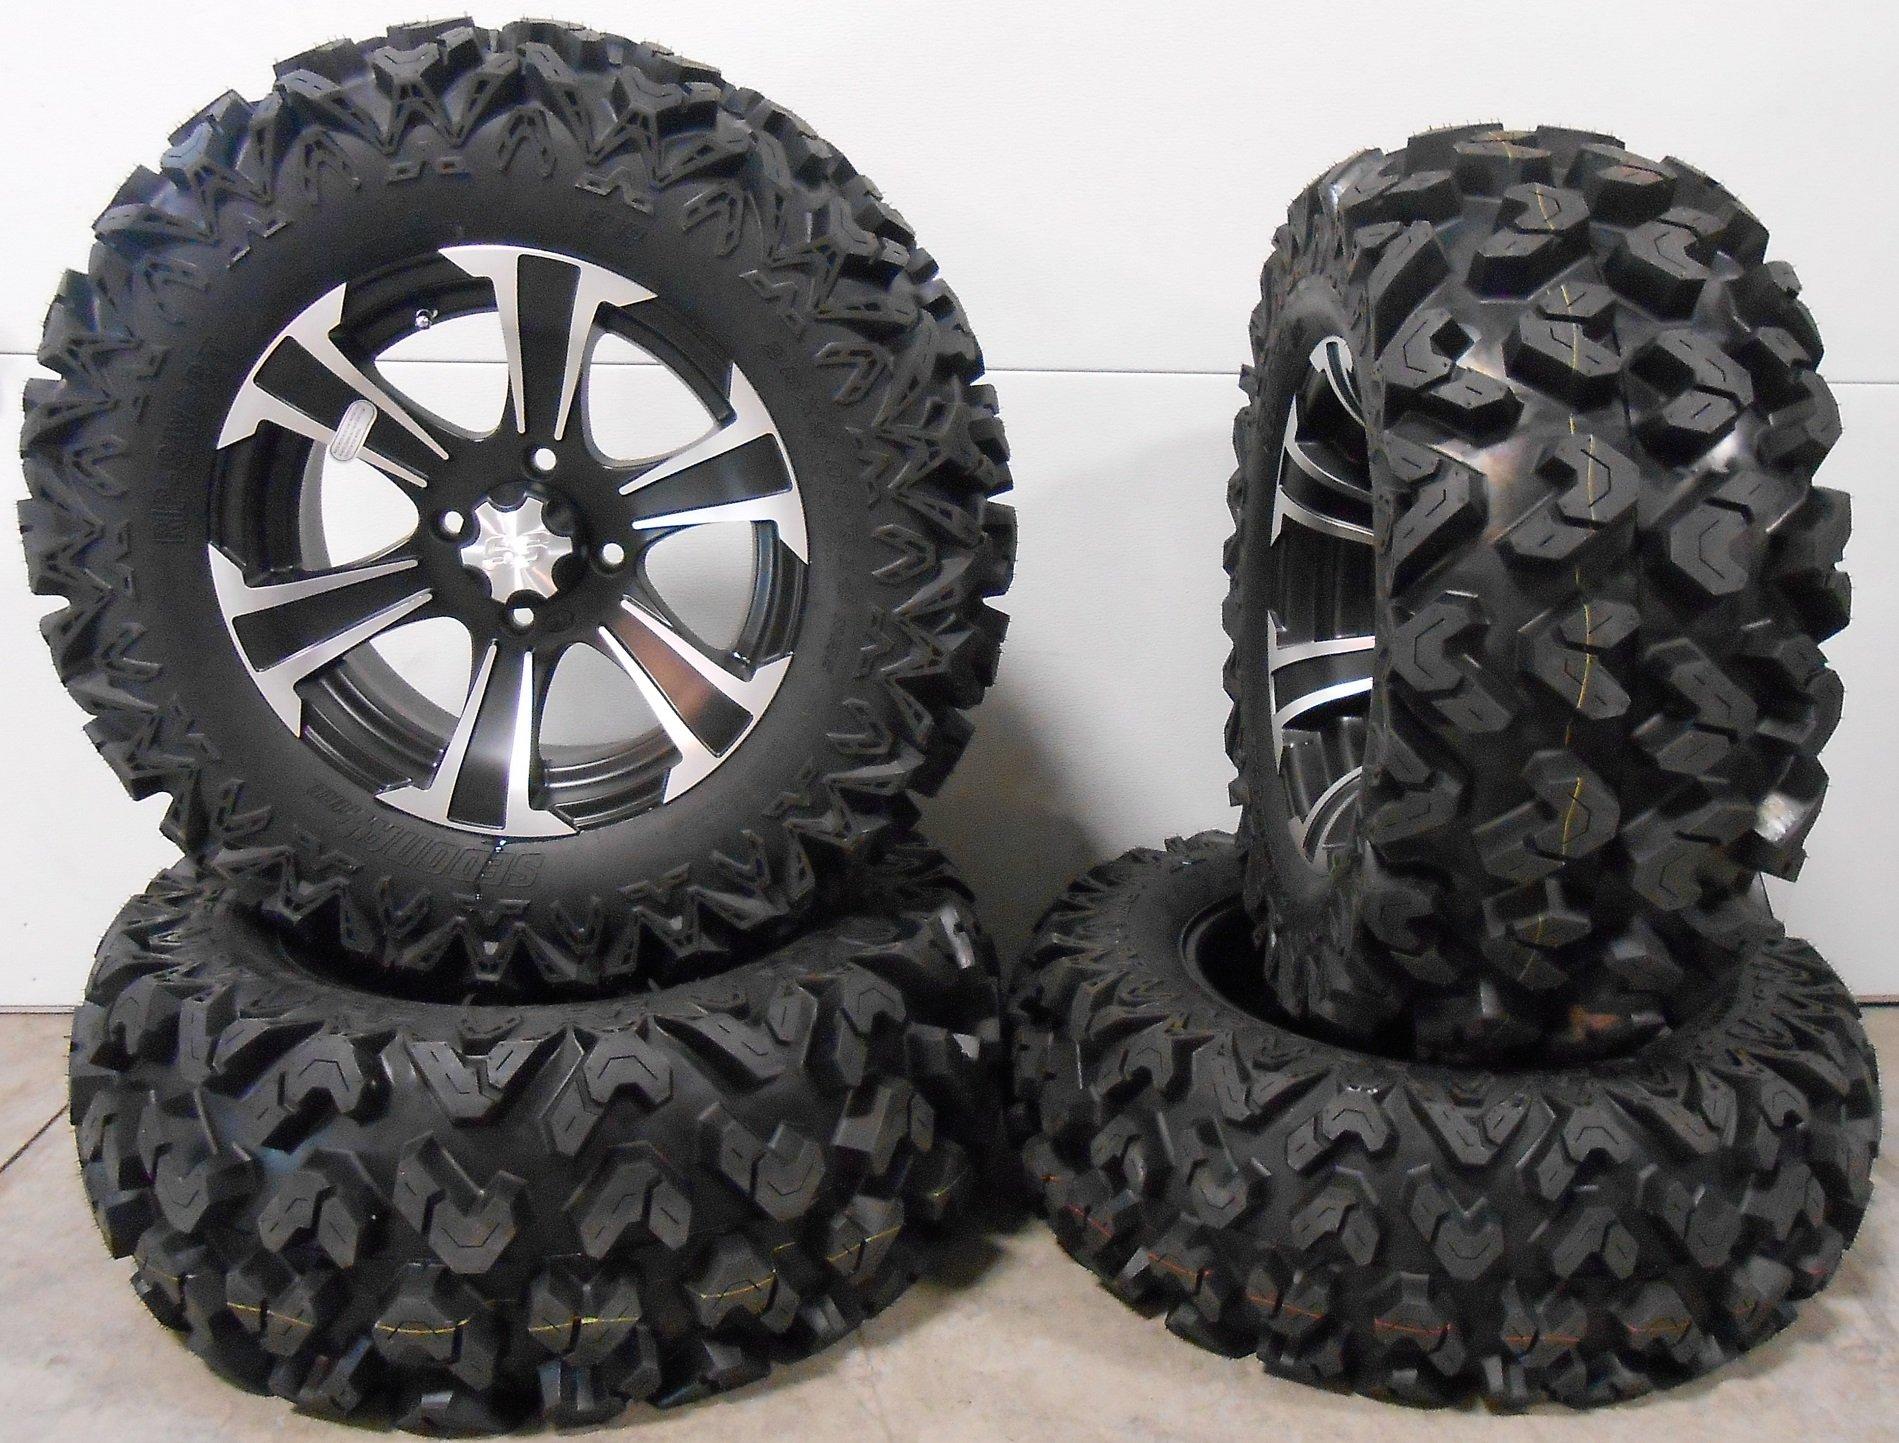 Bundle - 9 Items: ITP SS312 14'' Wheels Black 26'' Rip Saw Tires [4x110 Bolt Pattern 10mmx1.25 Lug Kit] by Powersports Bundle (Image #1)